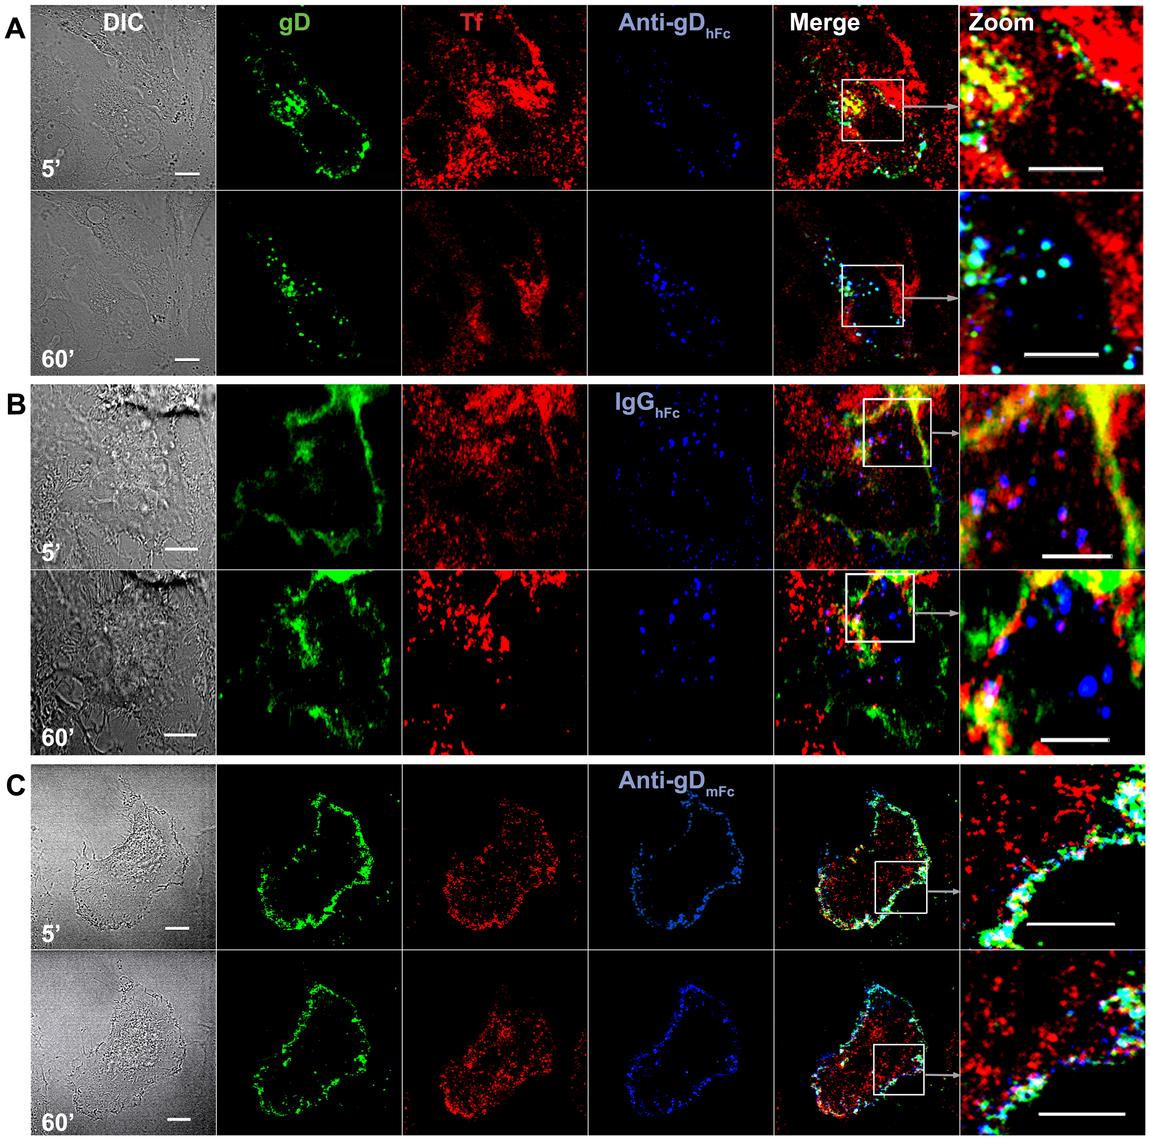 Endosomal trafficking of HSV-1 gD and IgG under ABB-permissive and non-permissive conditions.